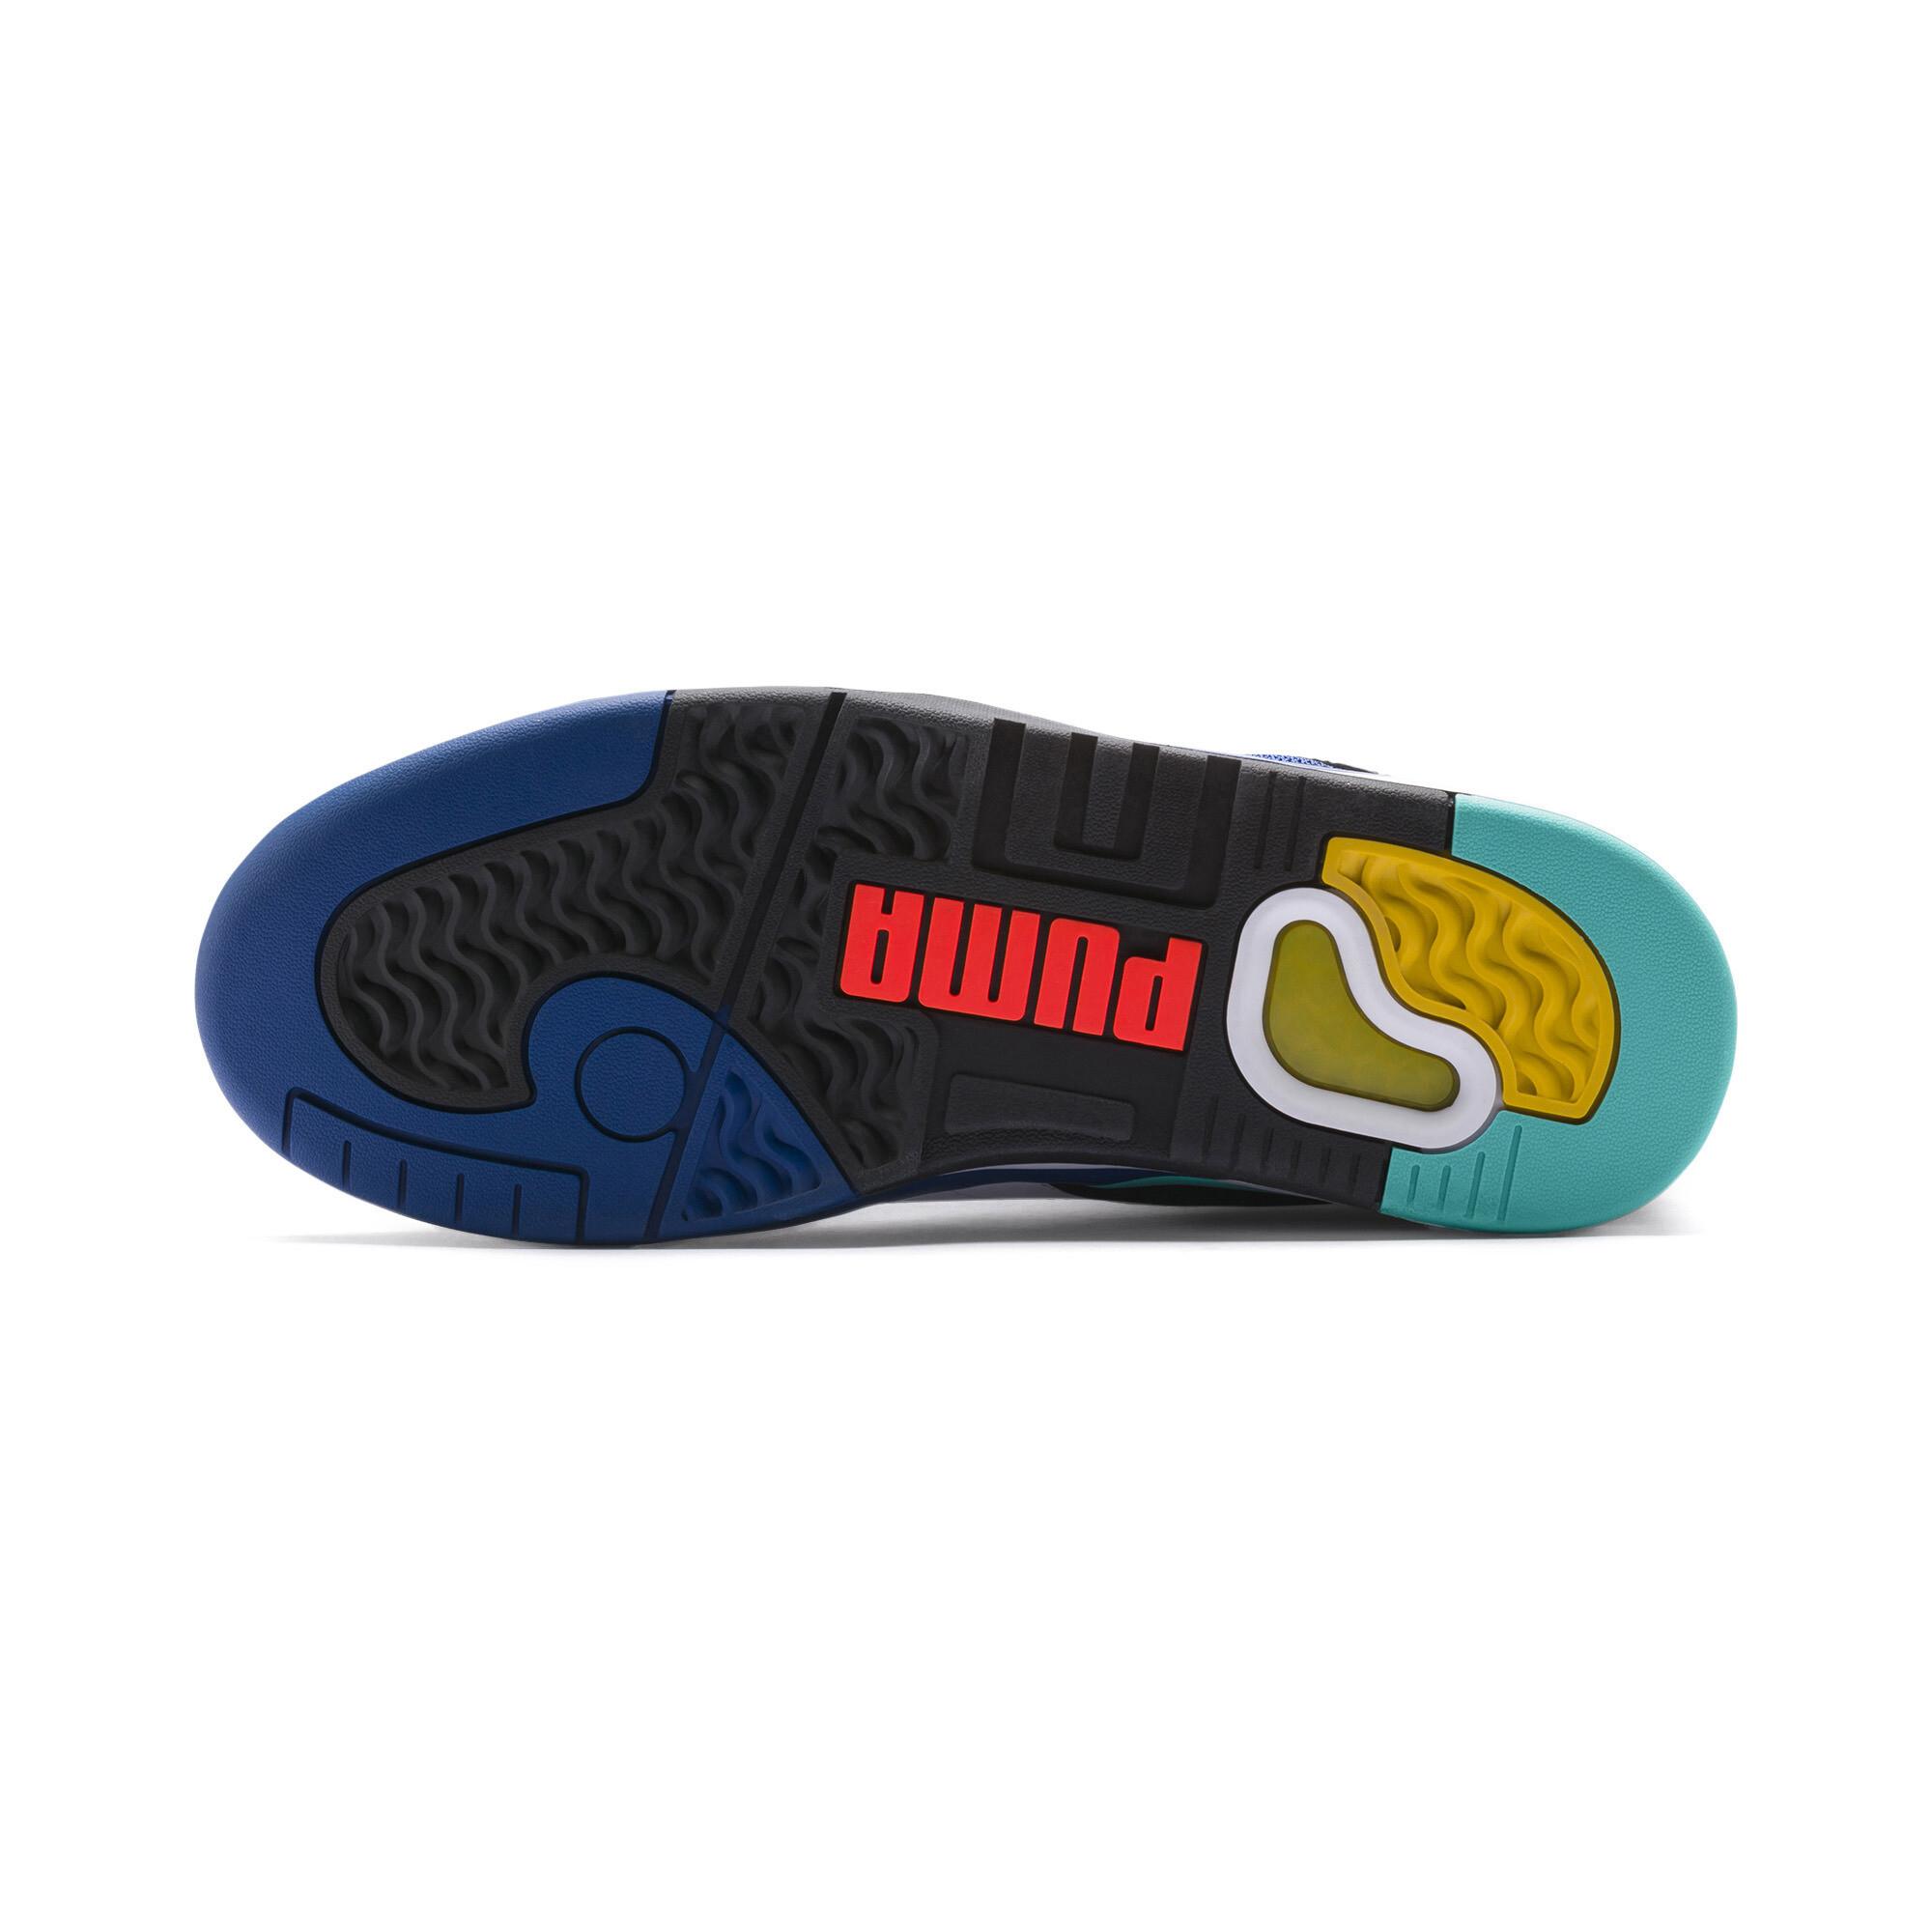 Indexbild 38 - PUMA Palace Guard Sneaker Unisex Schuhe Sport Classics Neu